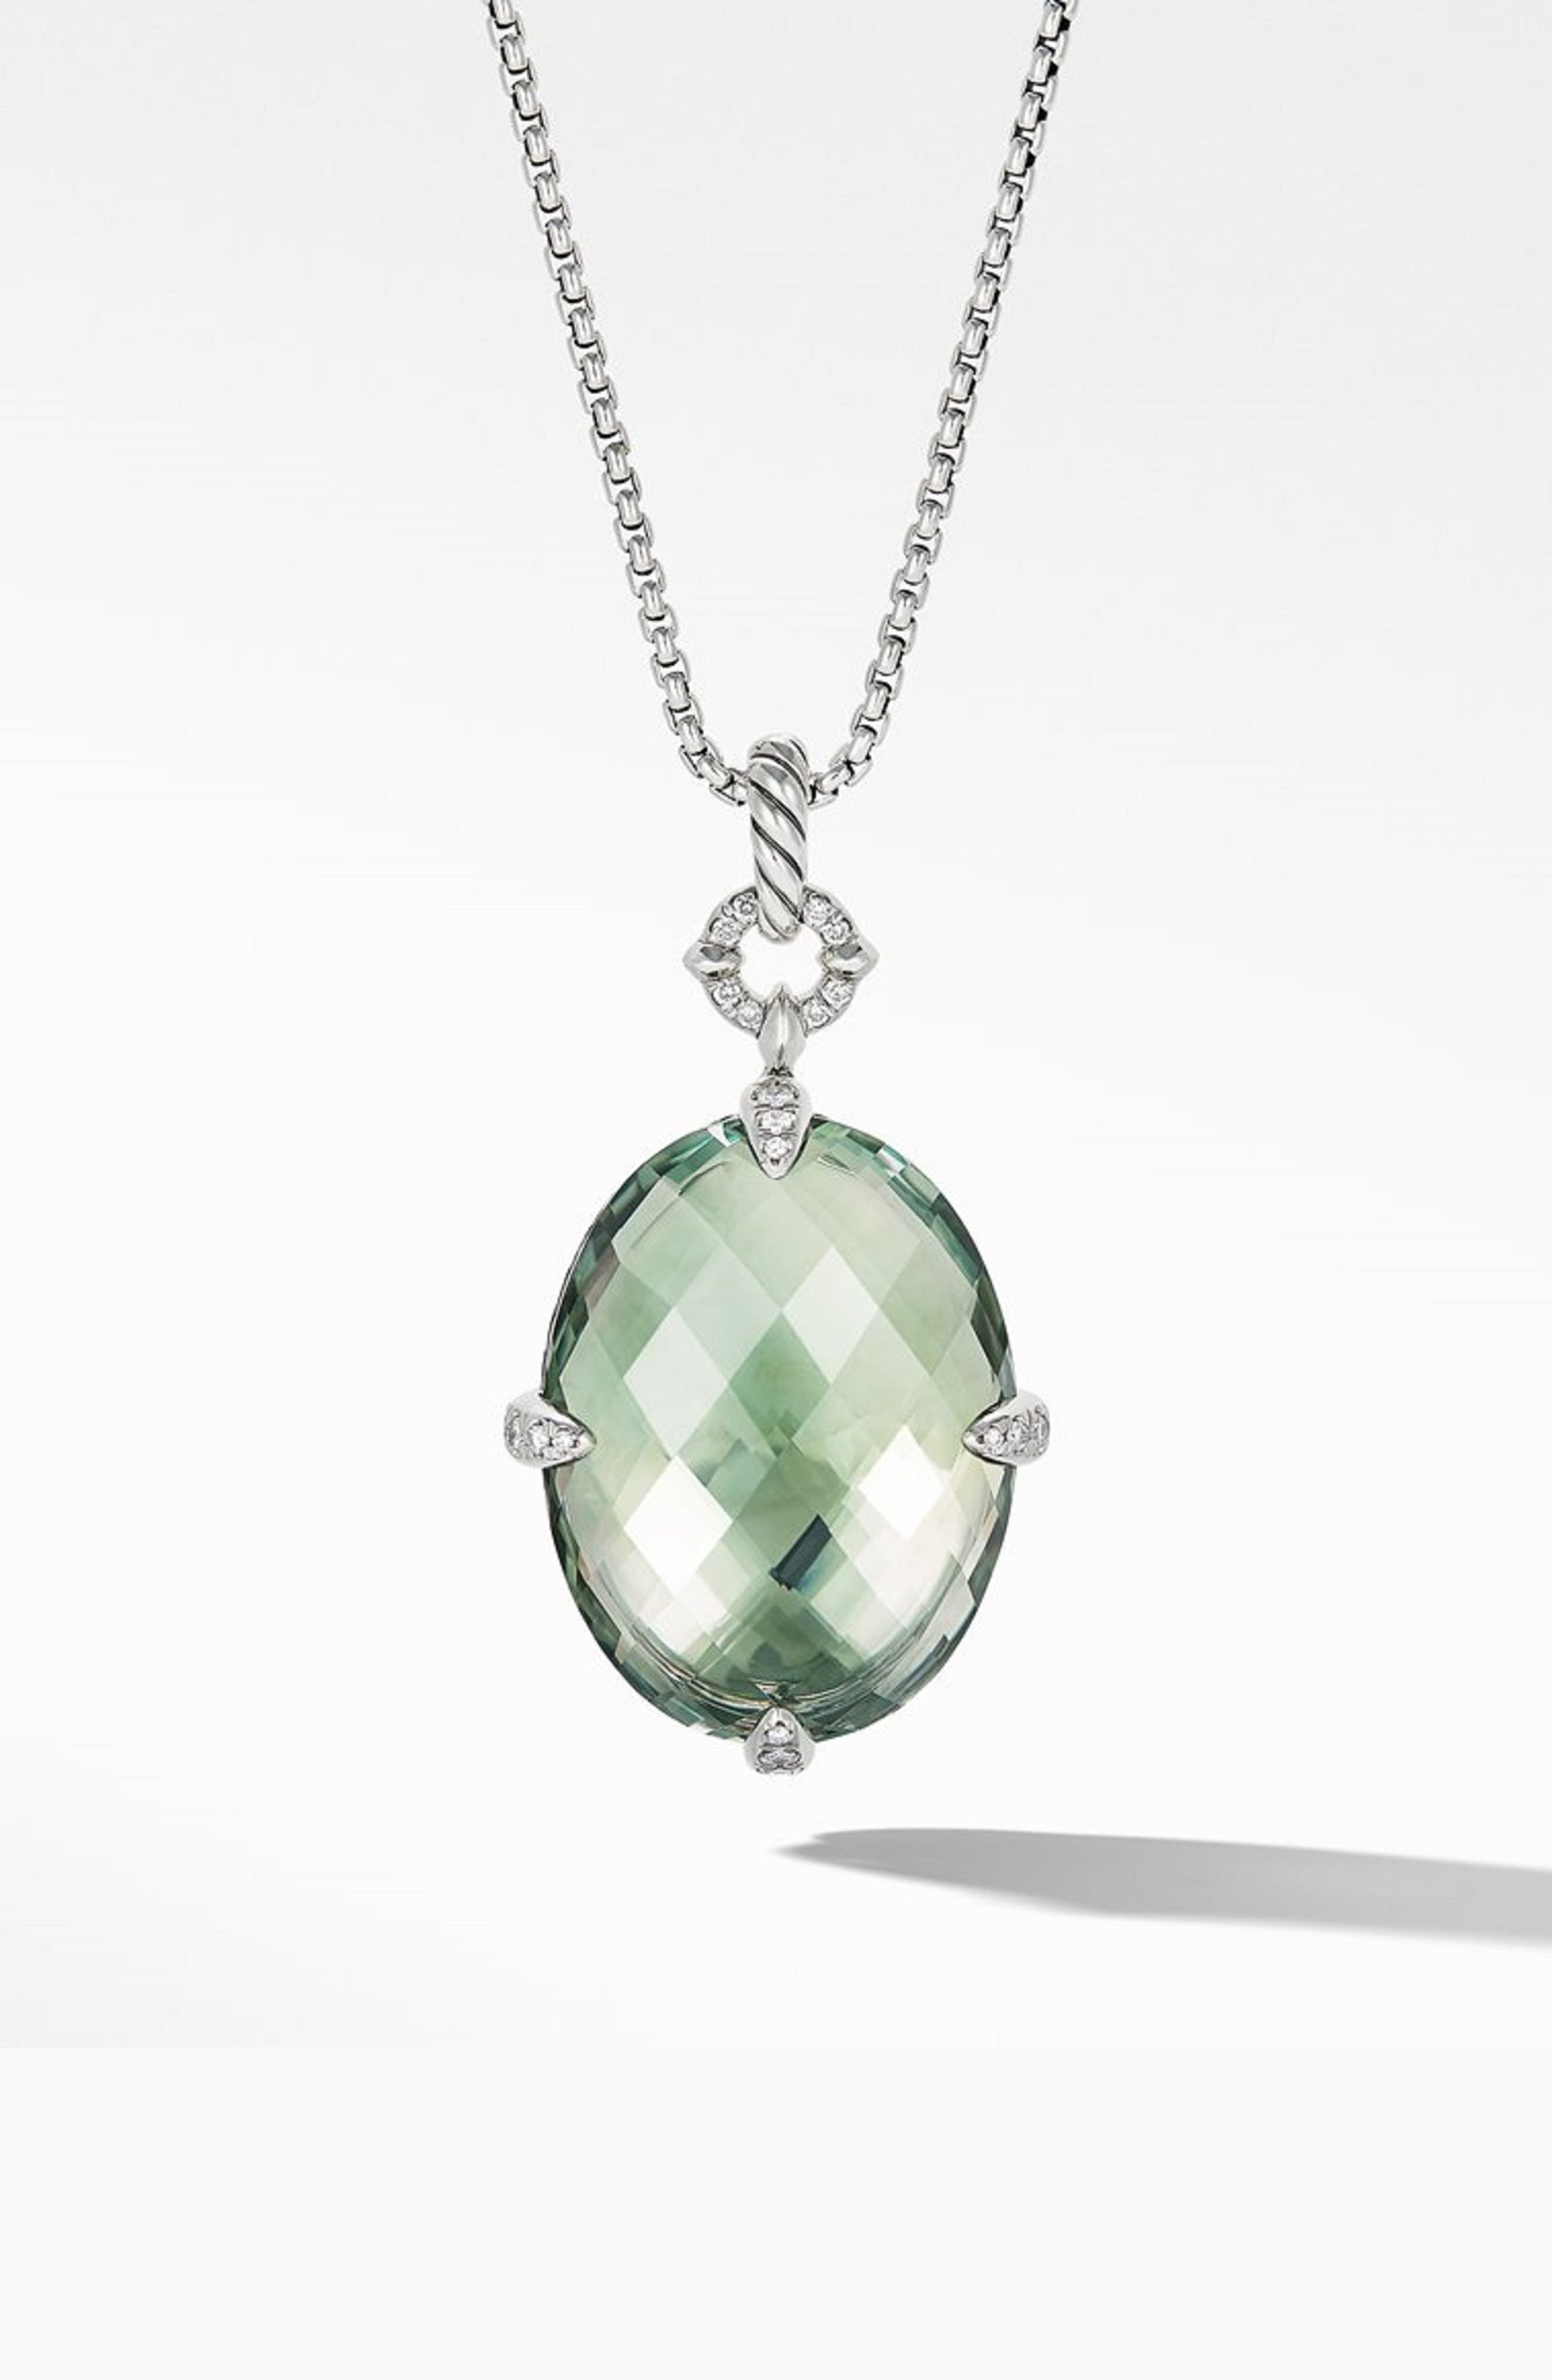 DAVID YURMAN,                             Statement Prasiolite Pendant Necklace with Diamonds,                             Main thumbnail 1, color,                             SILVER/ DIAMOND/ PRASIOLITE